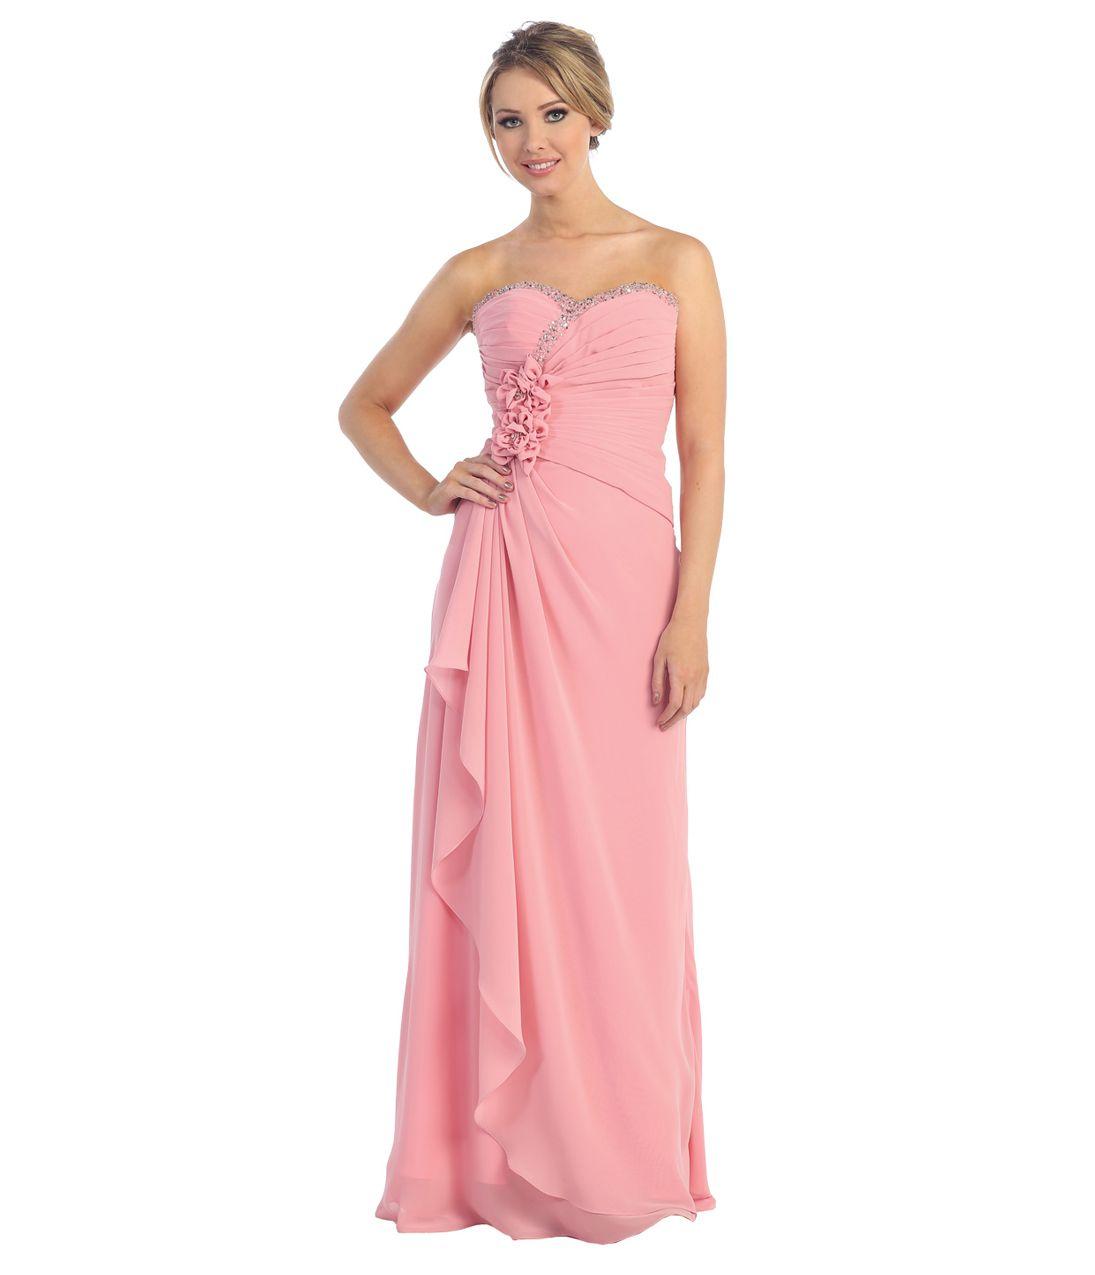 Rose Chiffon Prom Dress | Evening Dresses | Pinterest